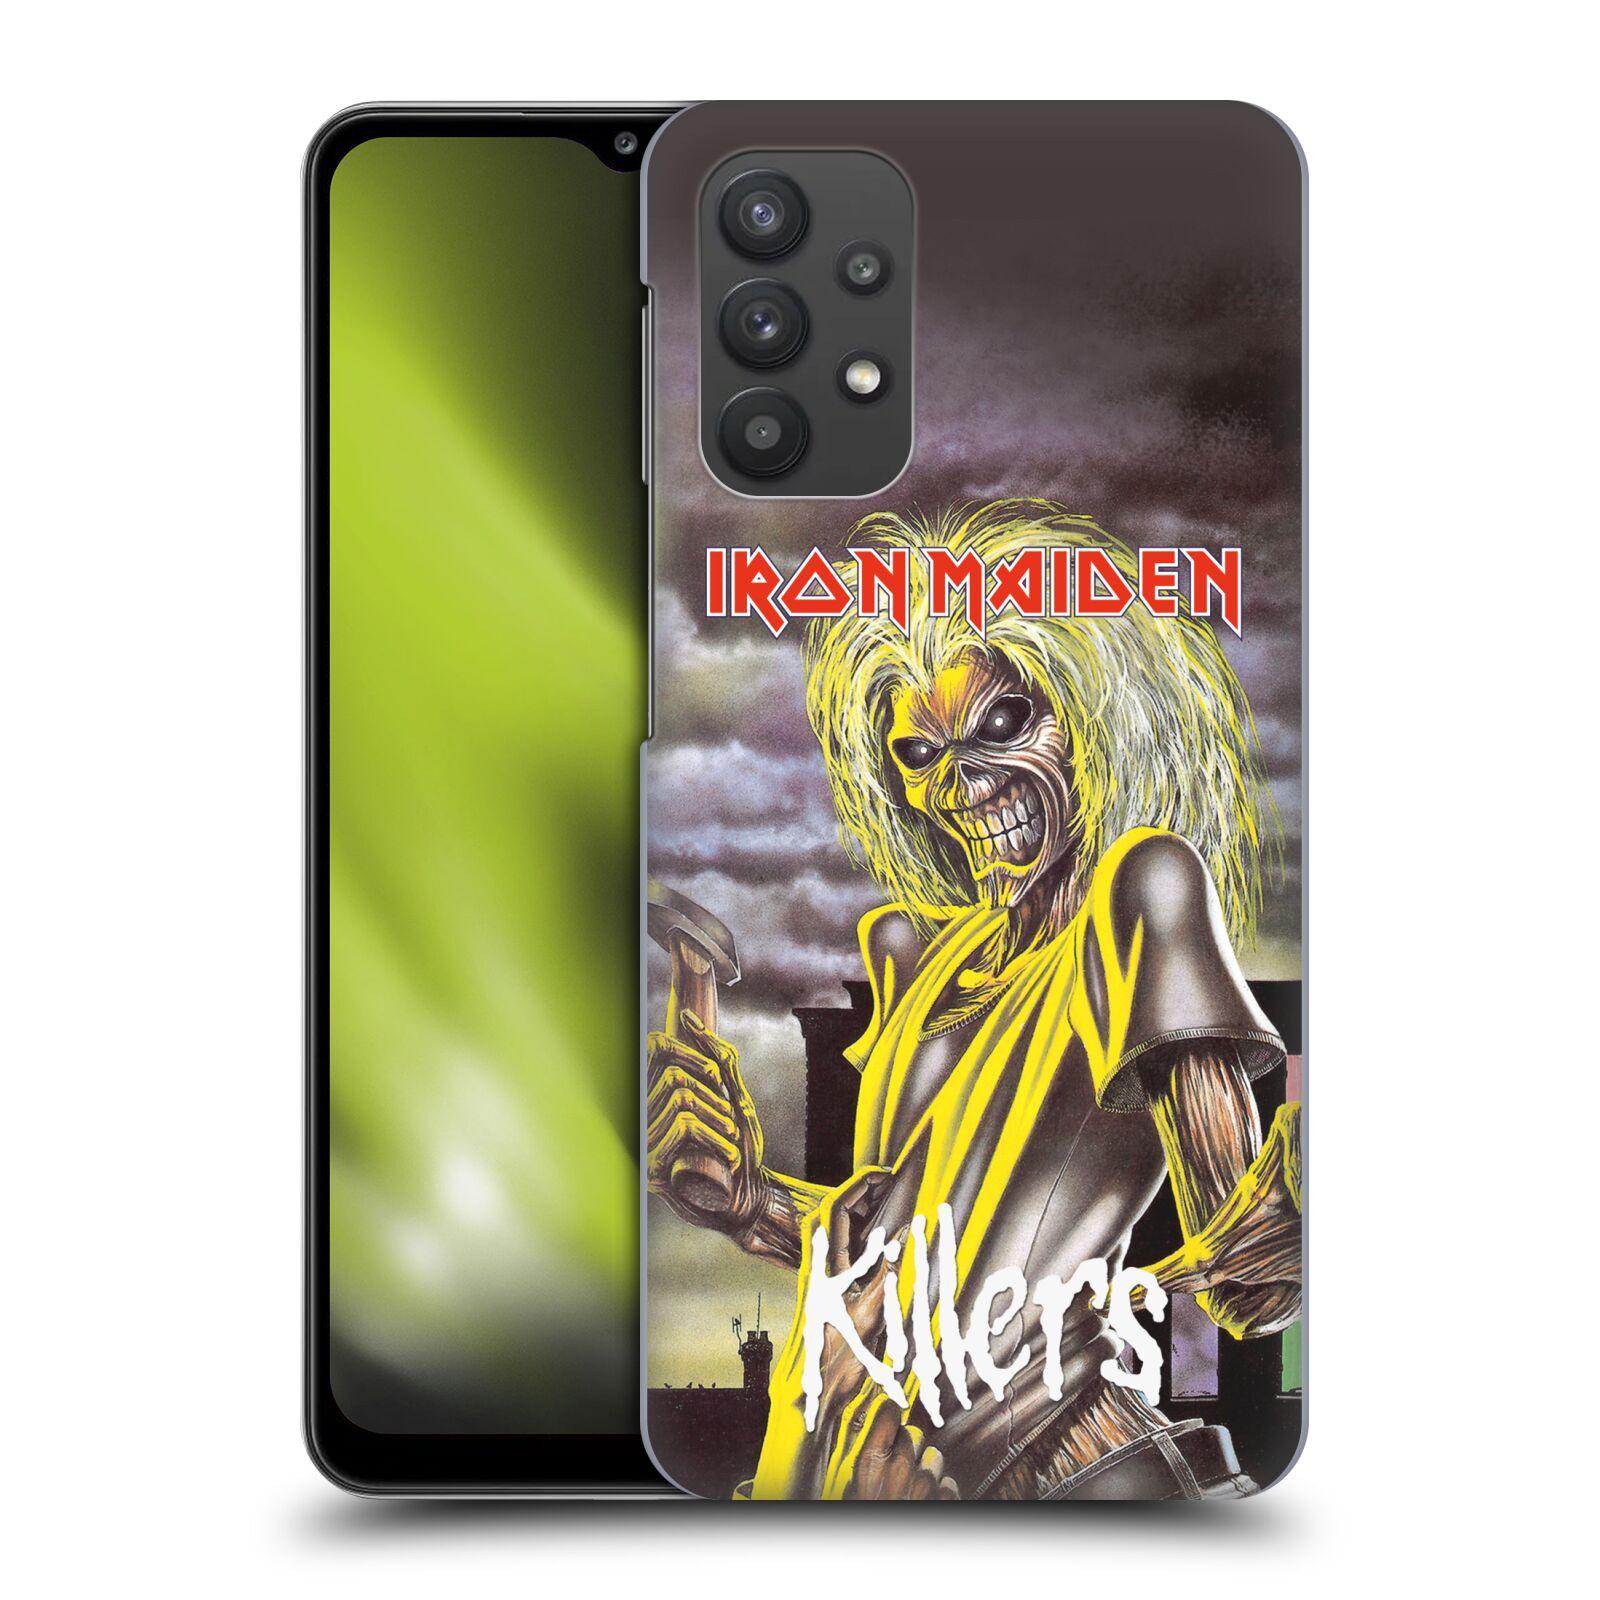 Plastové pouzdro na mobil Samsung Galaxy A32 5G - Head Case - Iron Maiden - Killers